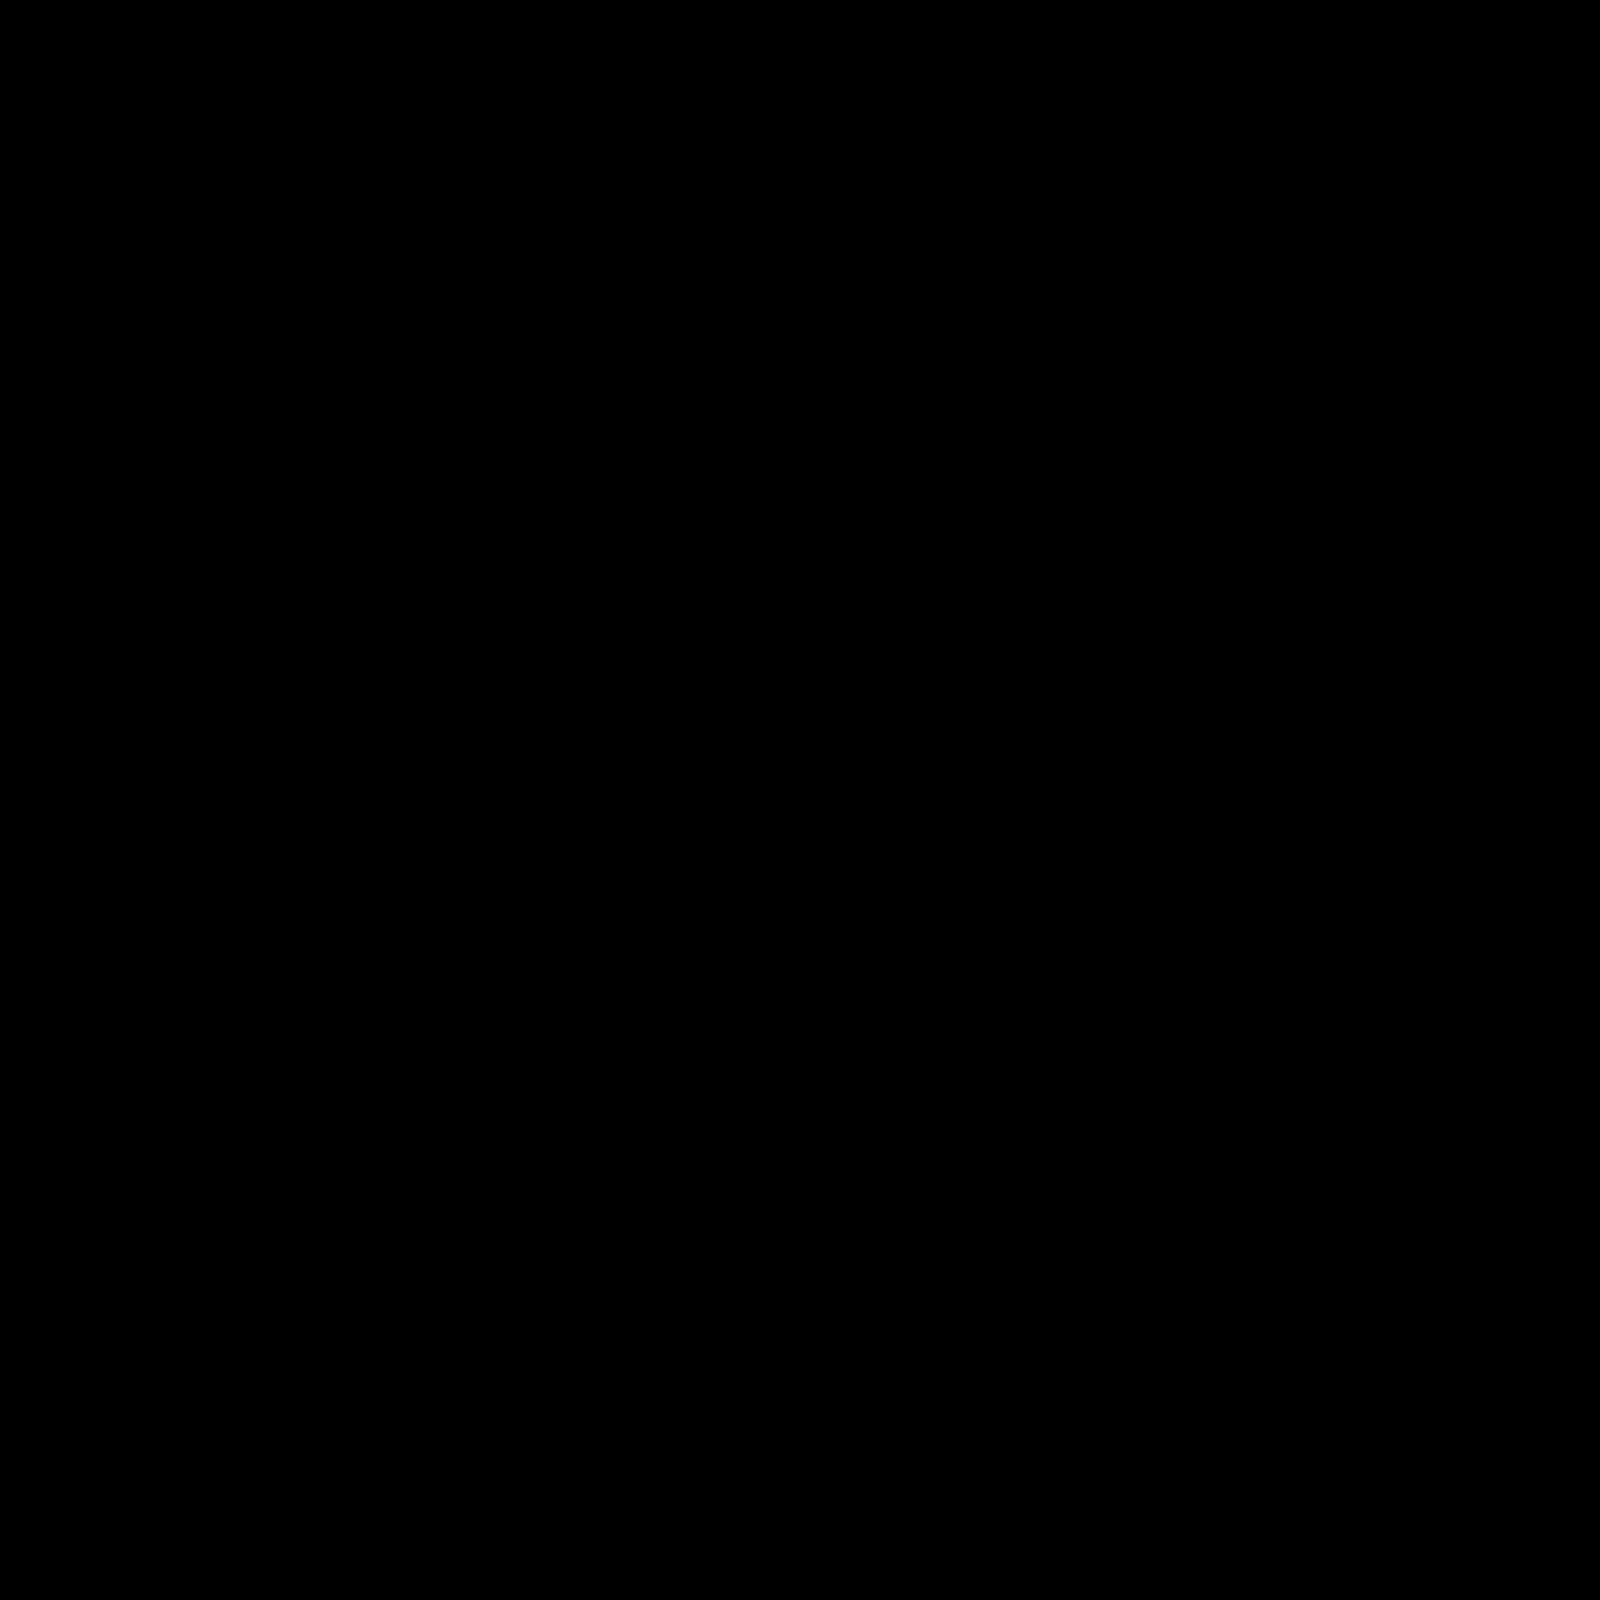 Advice icon